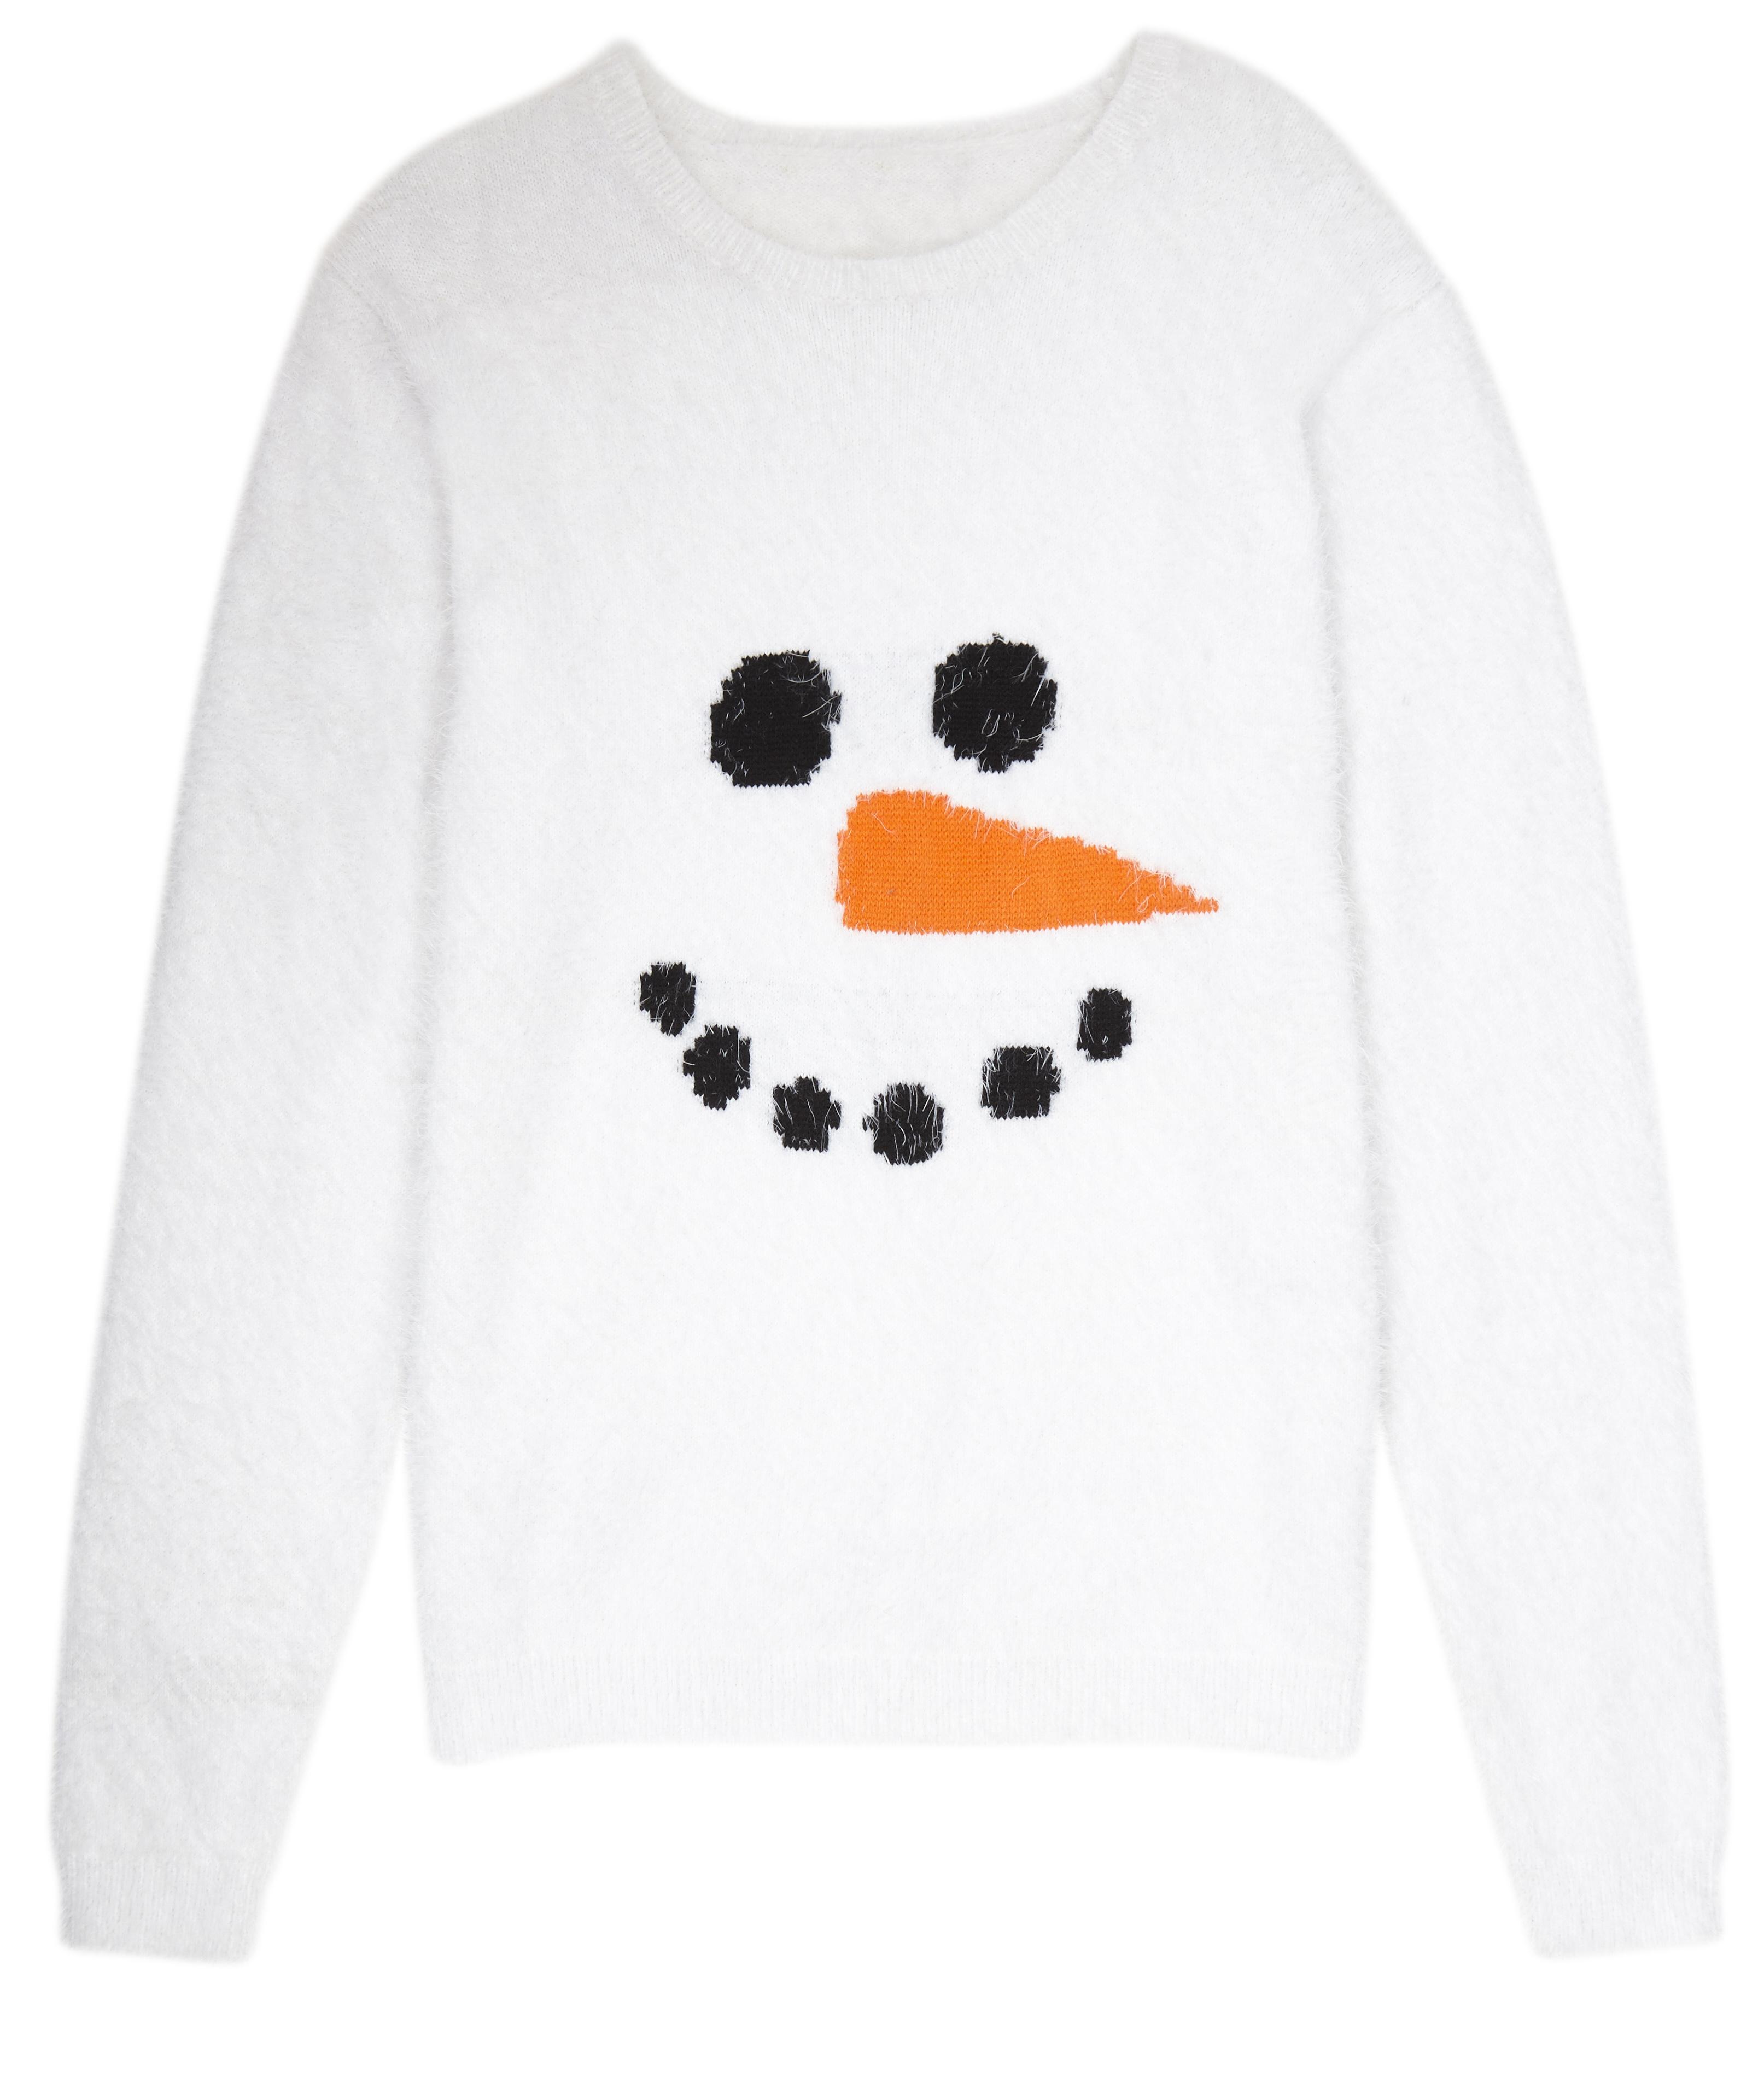 ASOS_Christmas_Jumper_in_Brushed_Yarn_Pris 423 SEK